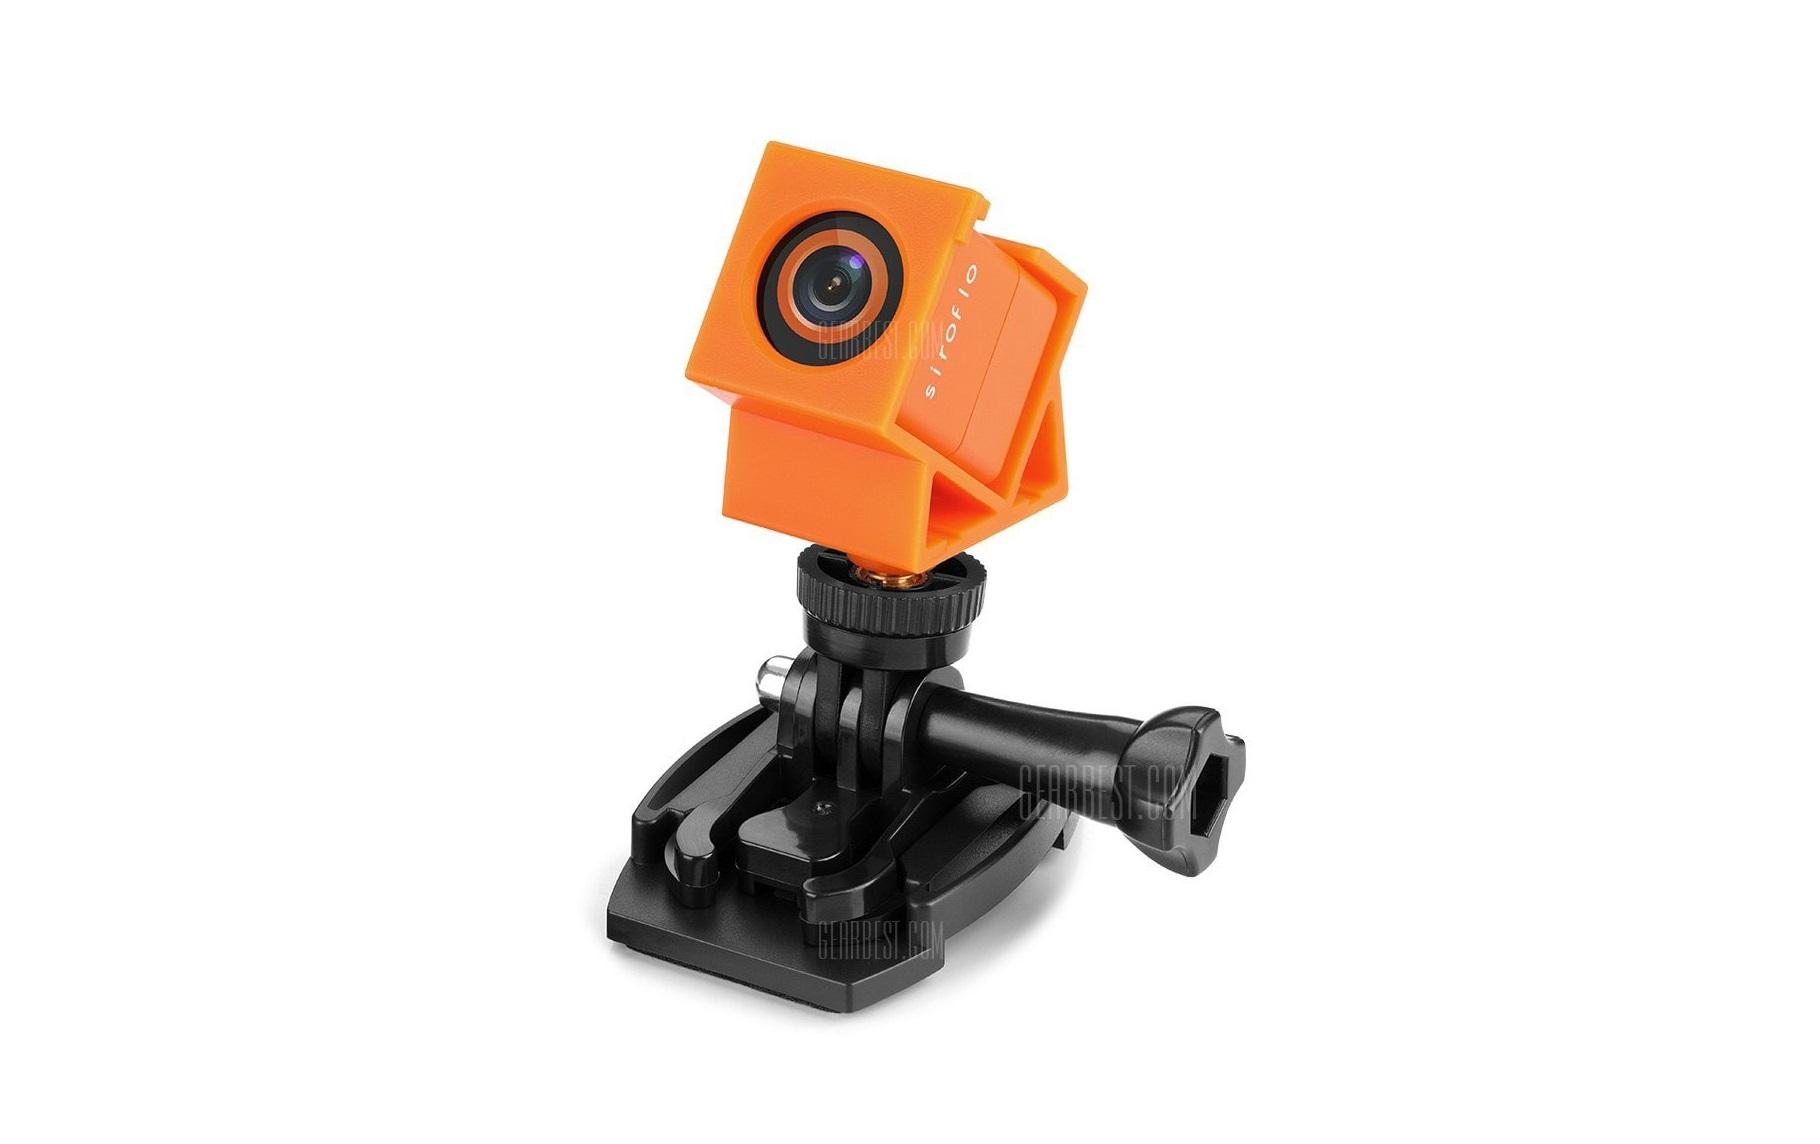 Akční kamerka Siroflo MINI DV nyní za výhodnou cenu [sponzorovaný článek]